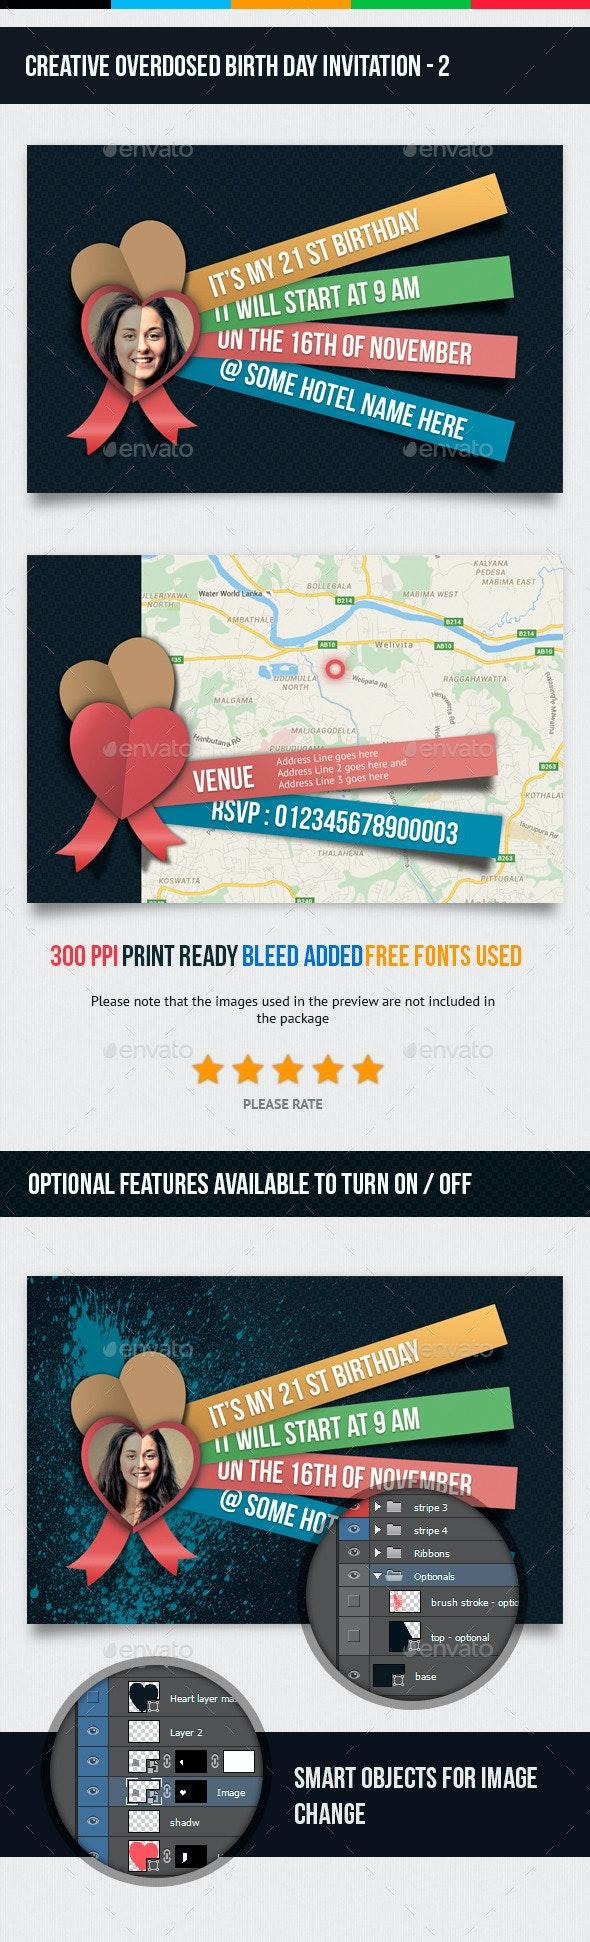 Birthday Invitation - 2 - Cards & Invites Print Templates